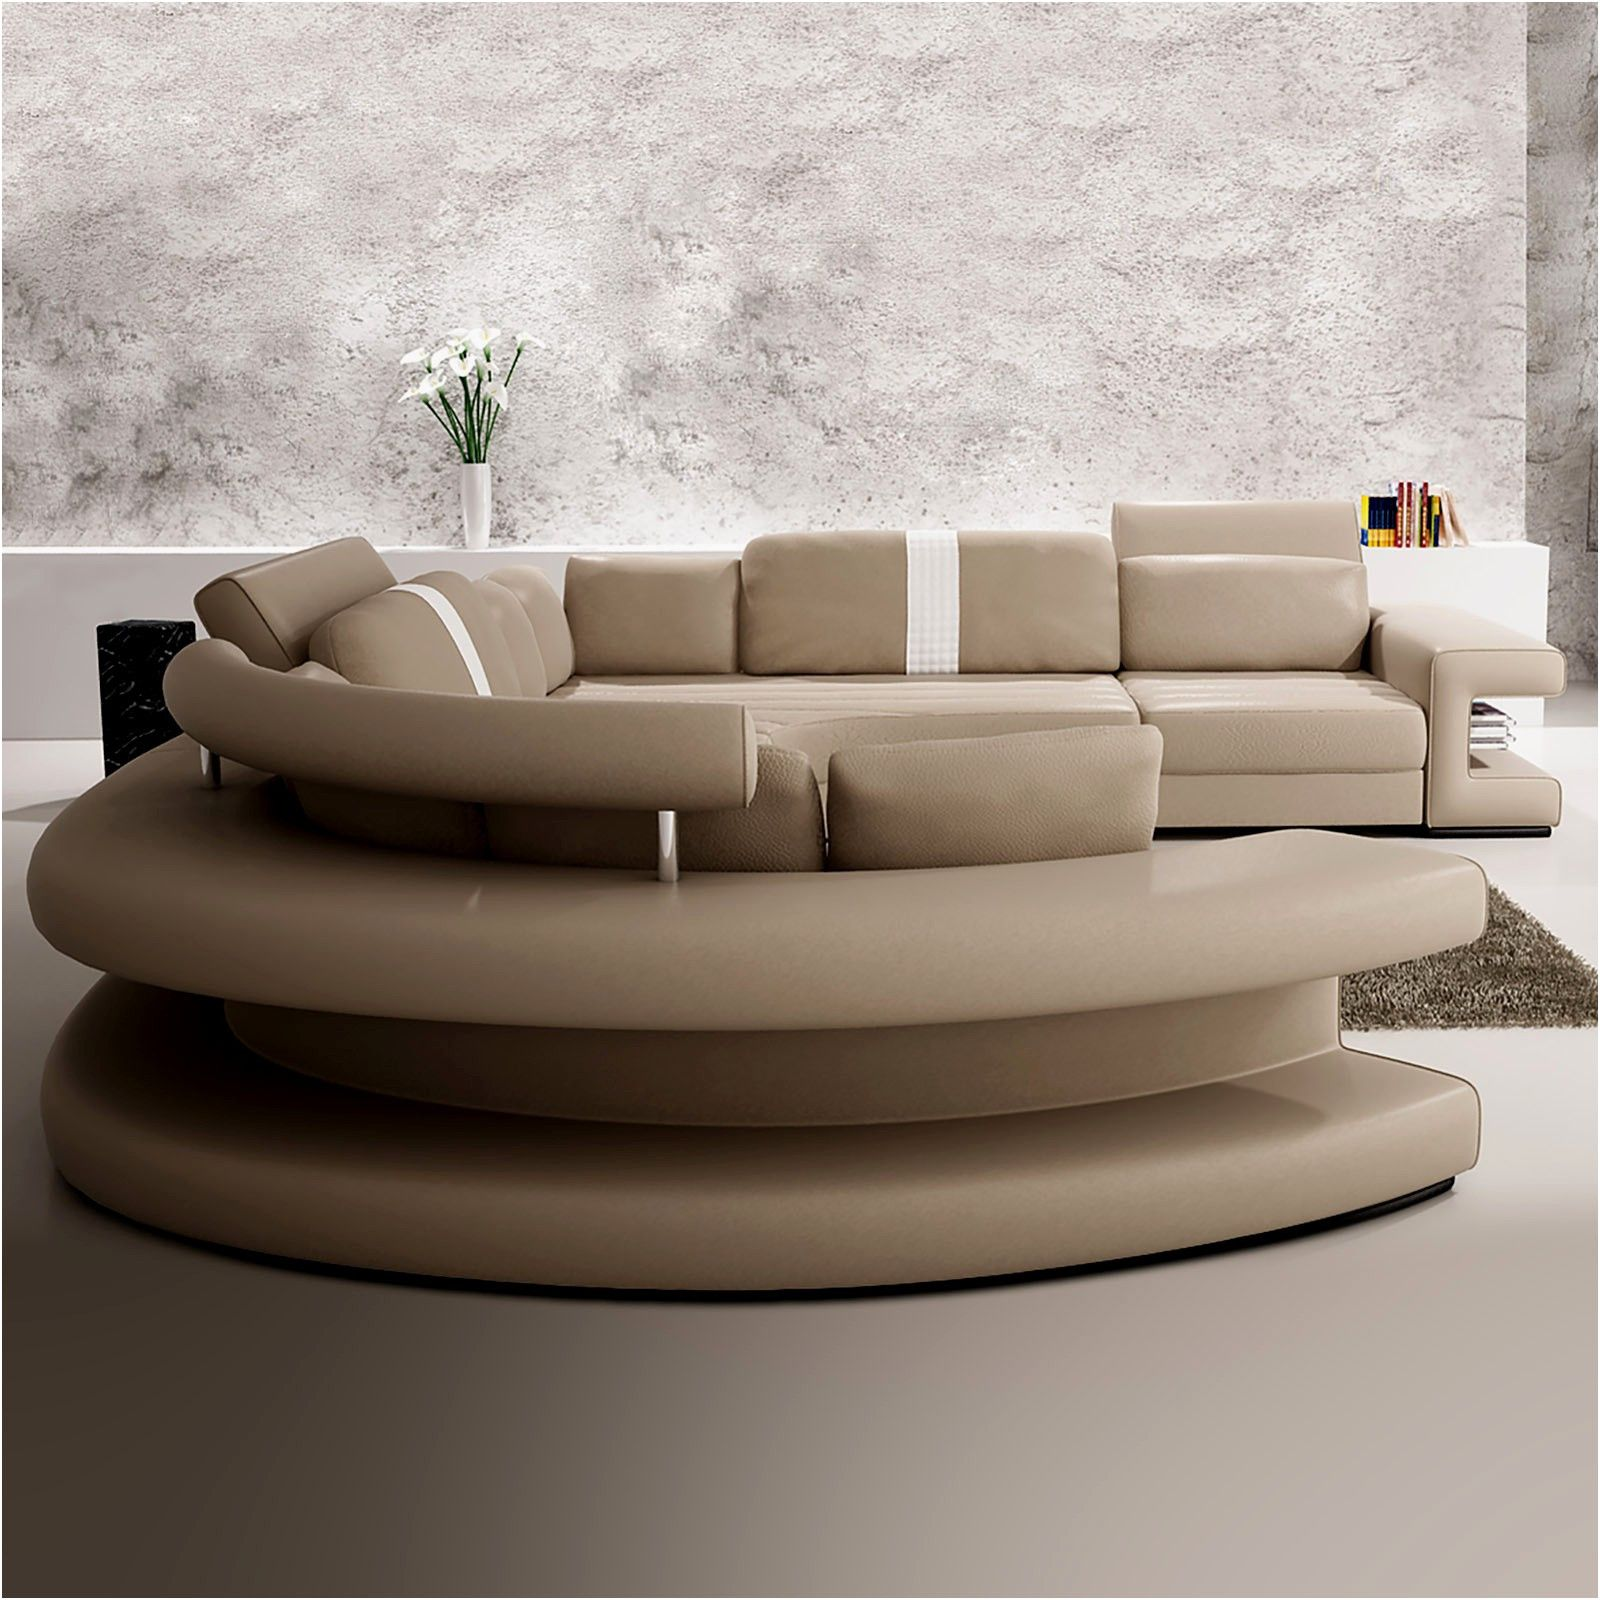 Experte Sofa Turkis Modern Sofa Sectional Sectional Sofa Sofa